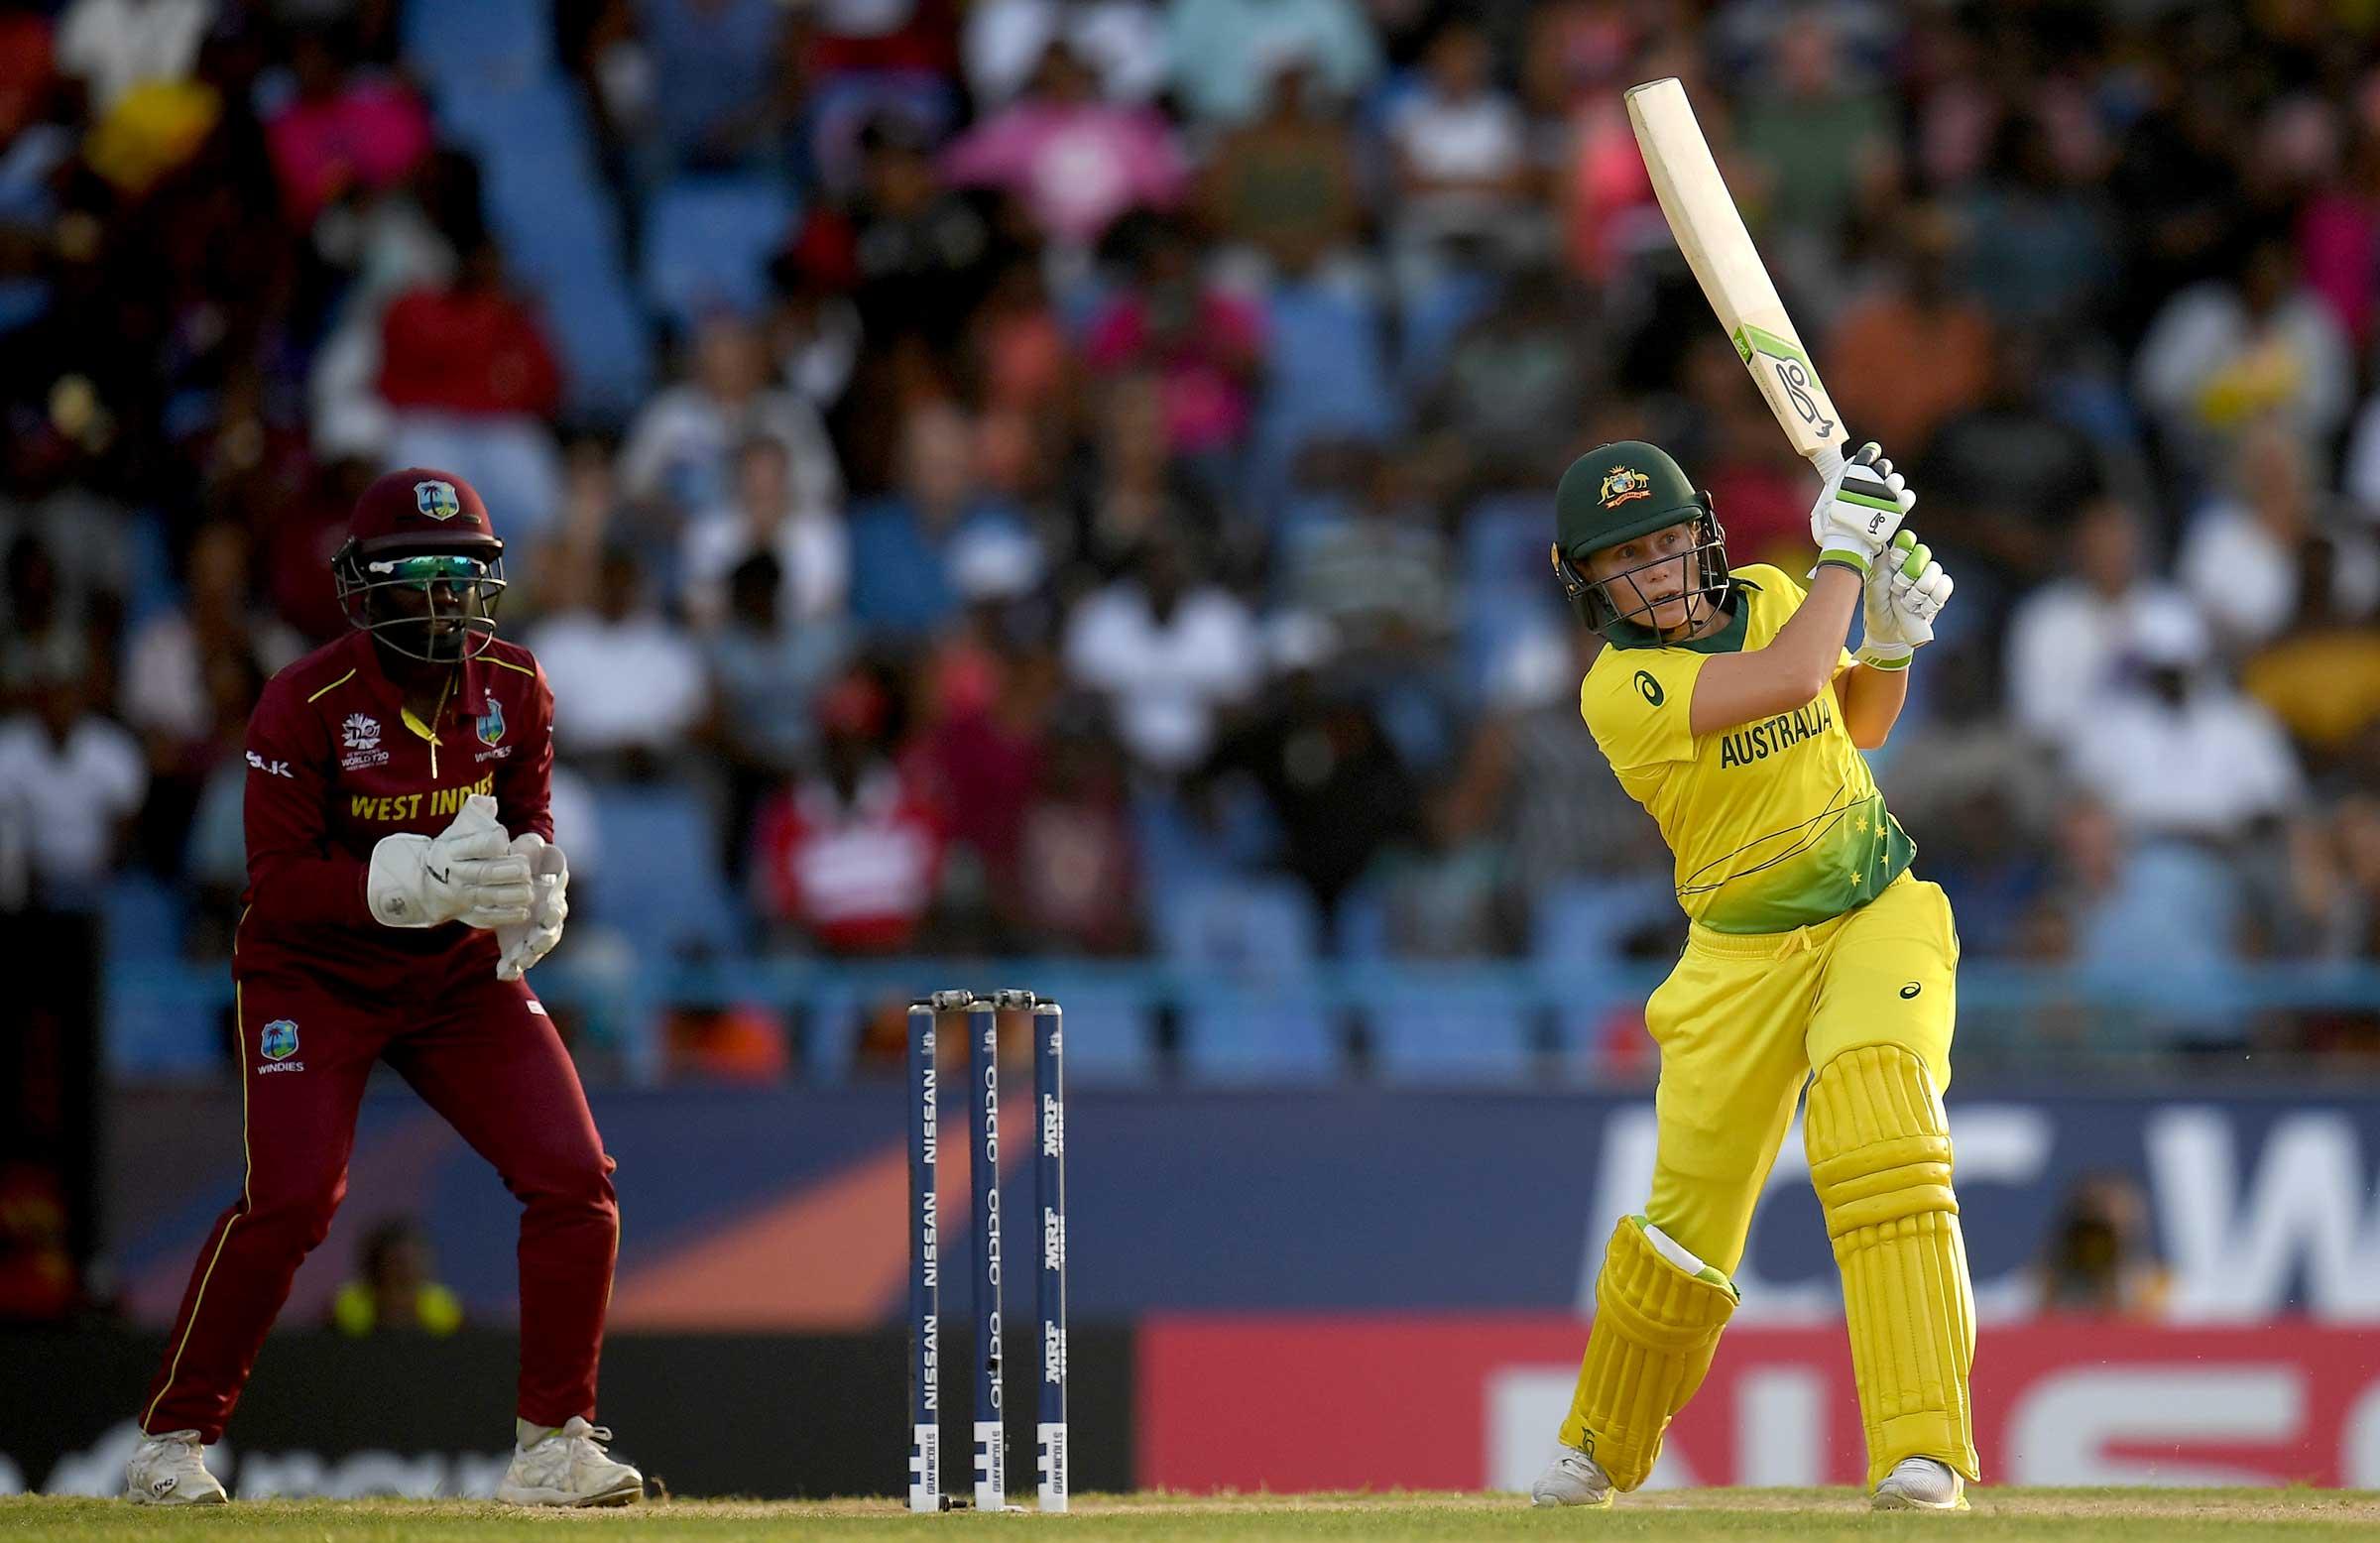 Alyssa Healy goes on the attack for Australia // cricket.com.au